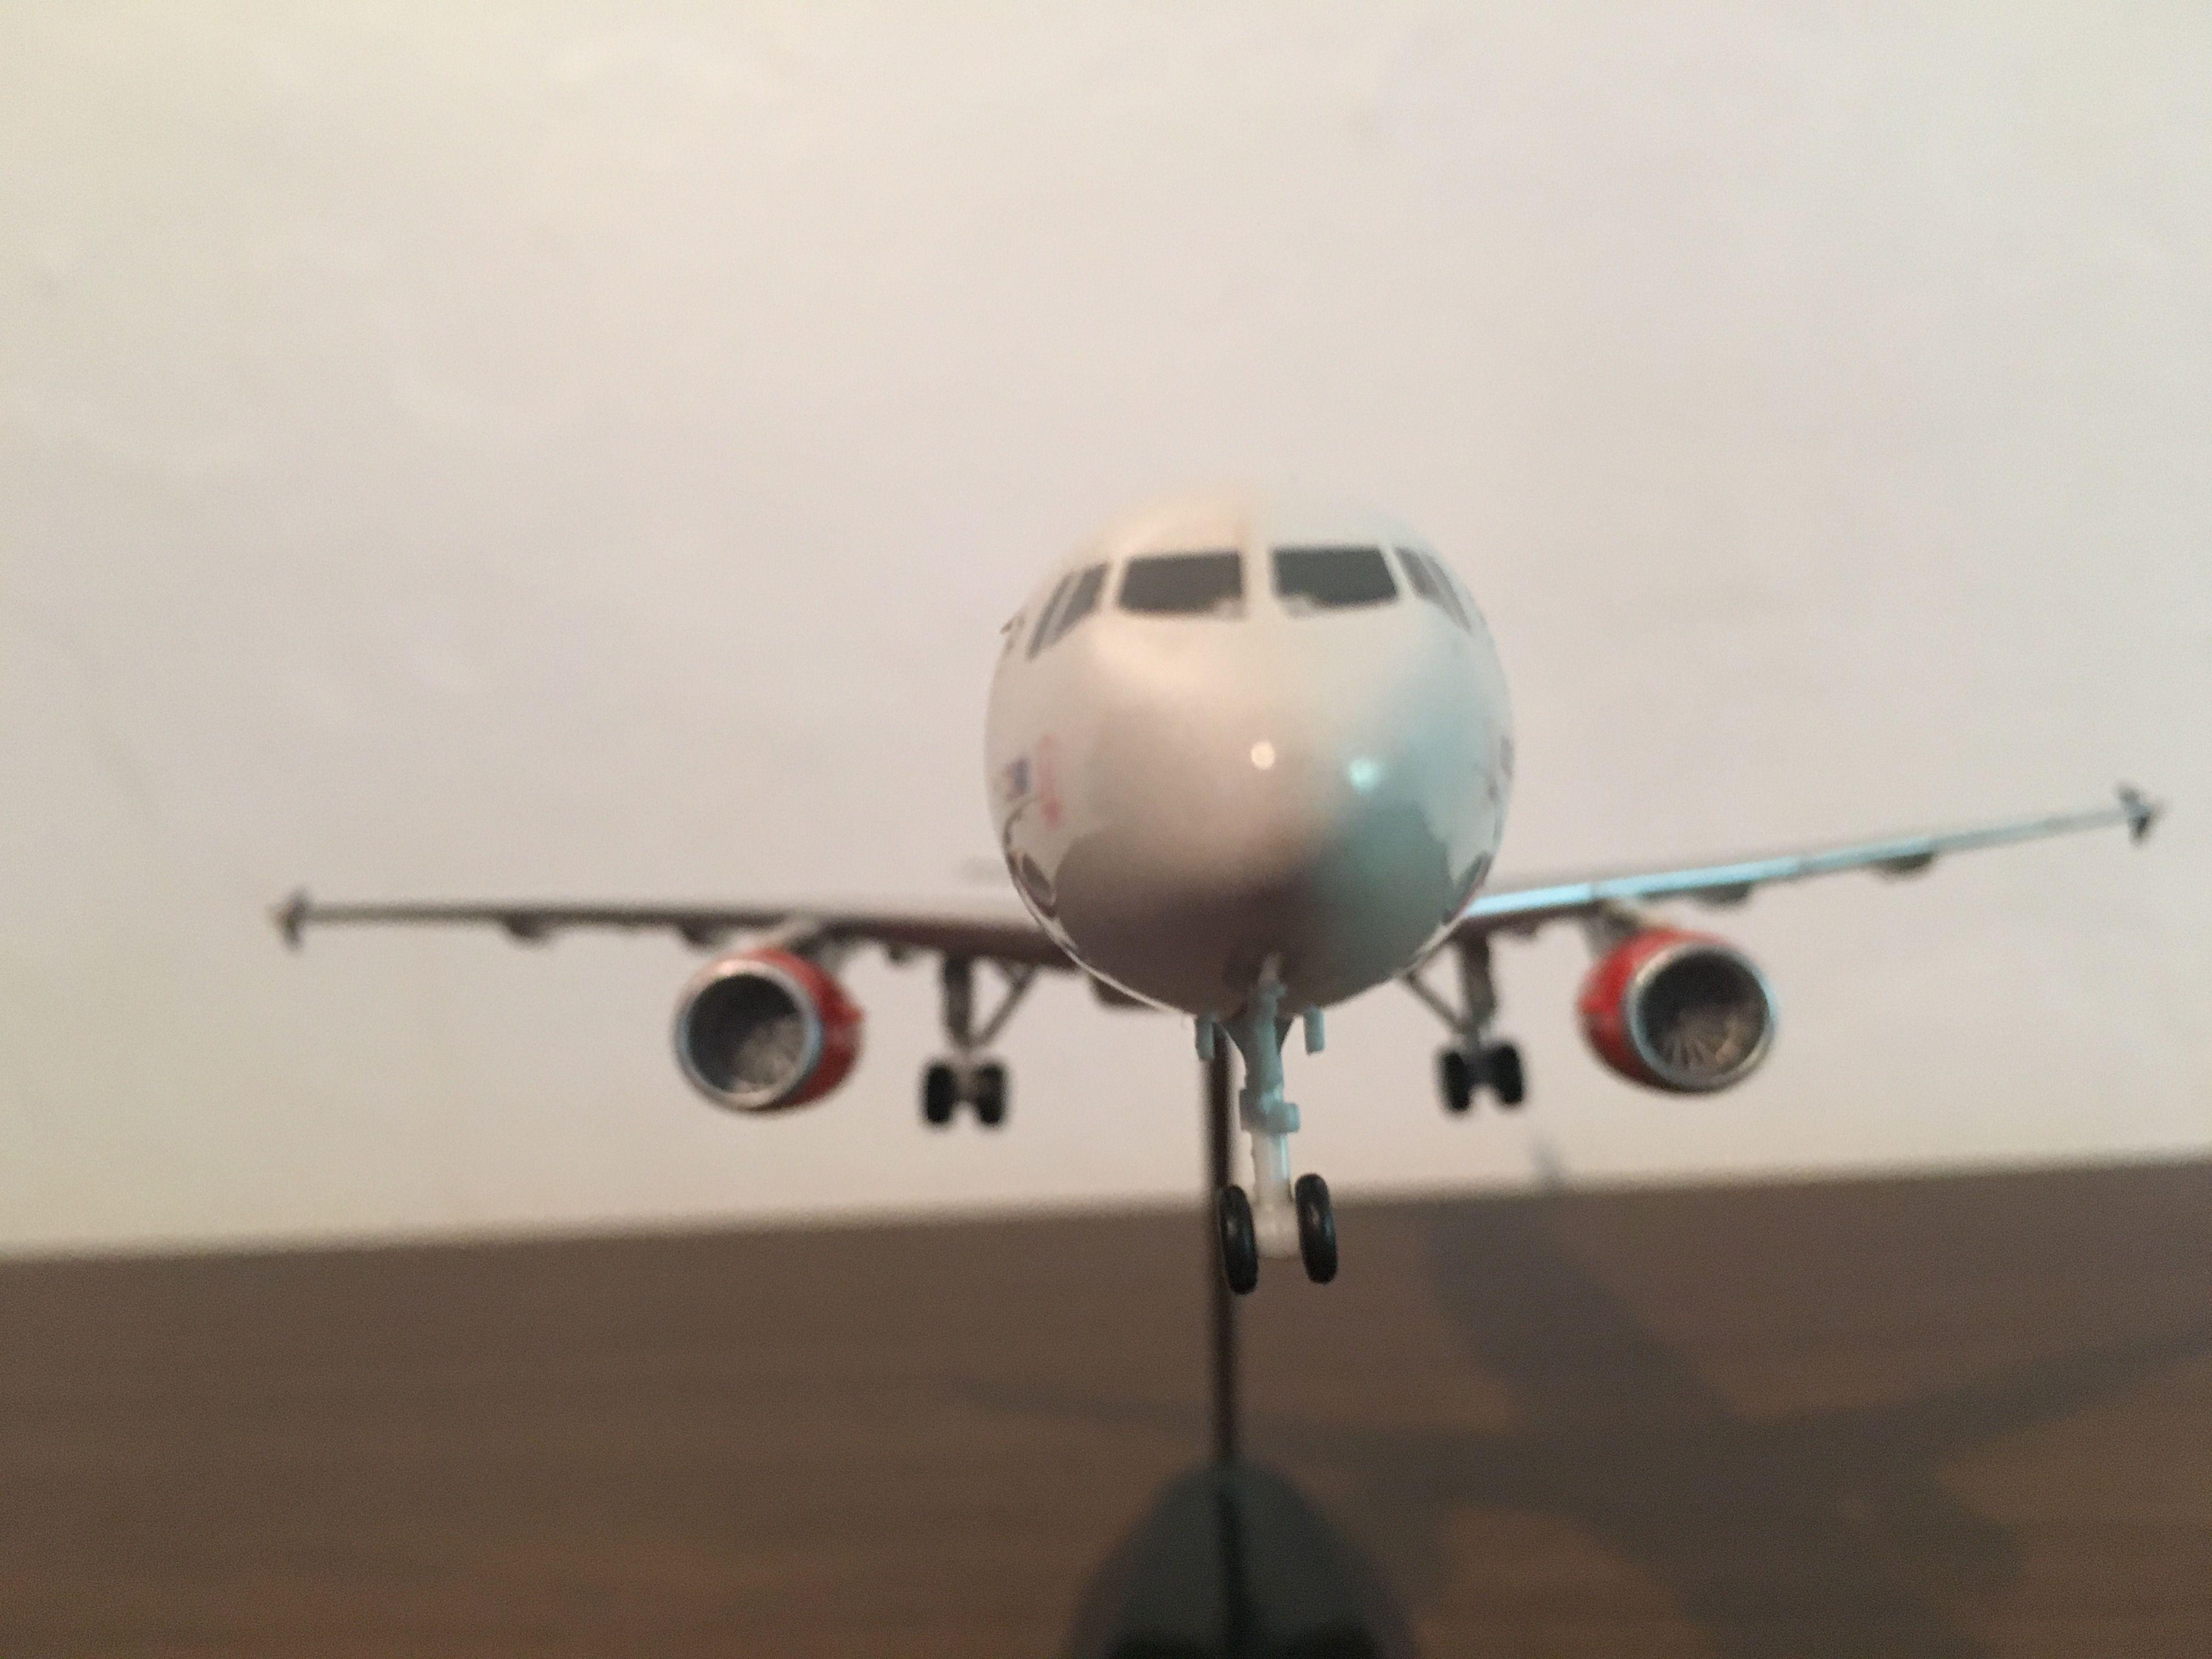 Pin On Sas Scandinavian Airline A321 200 1 200 Scale Model Aeroplane Starjets